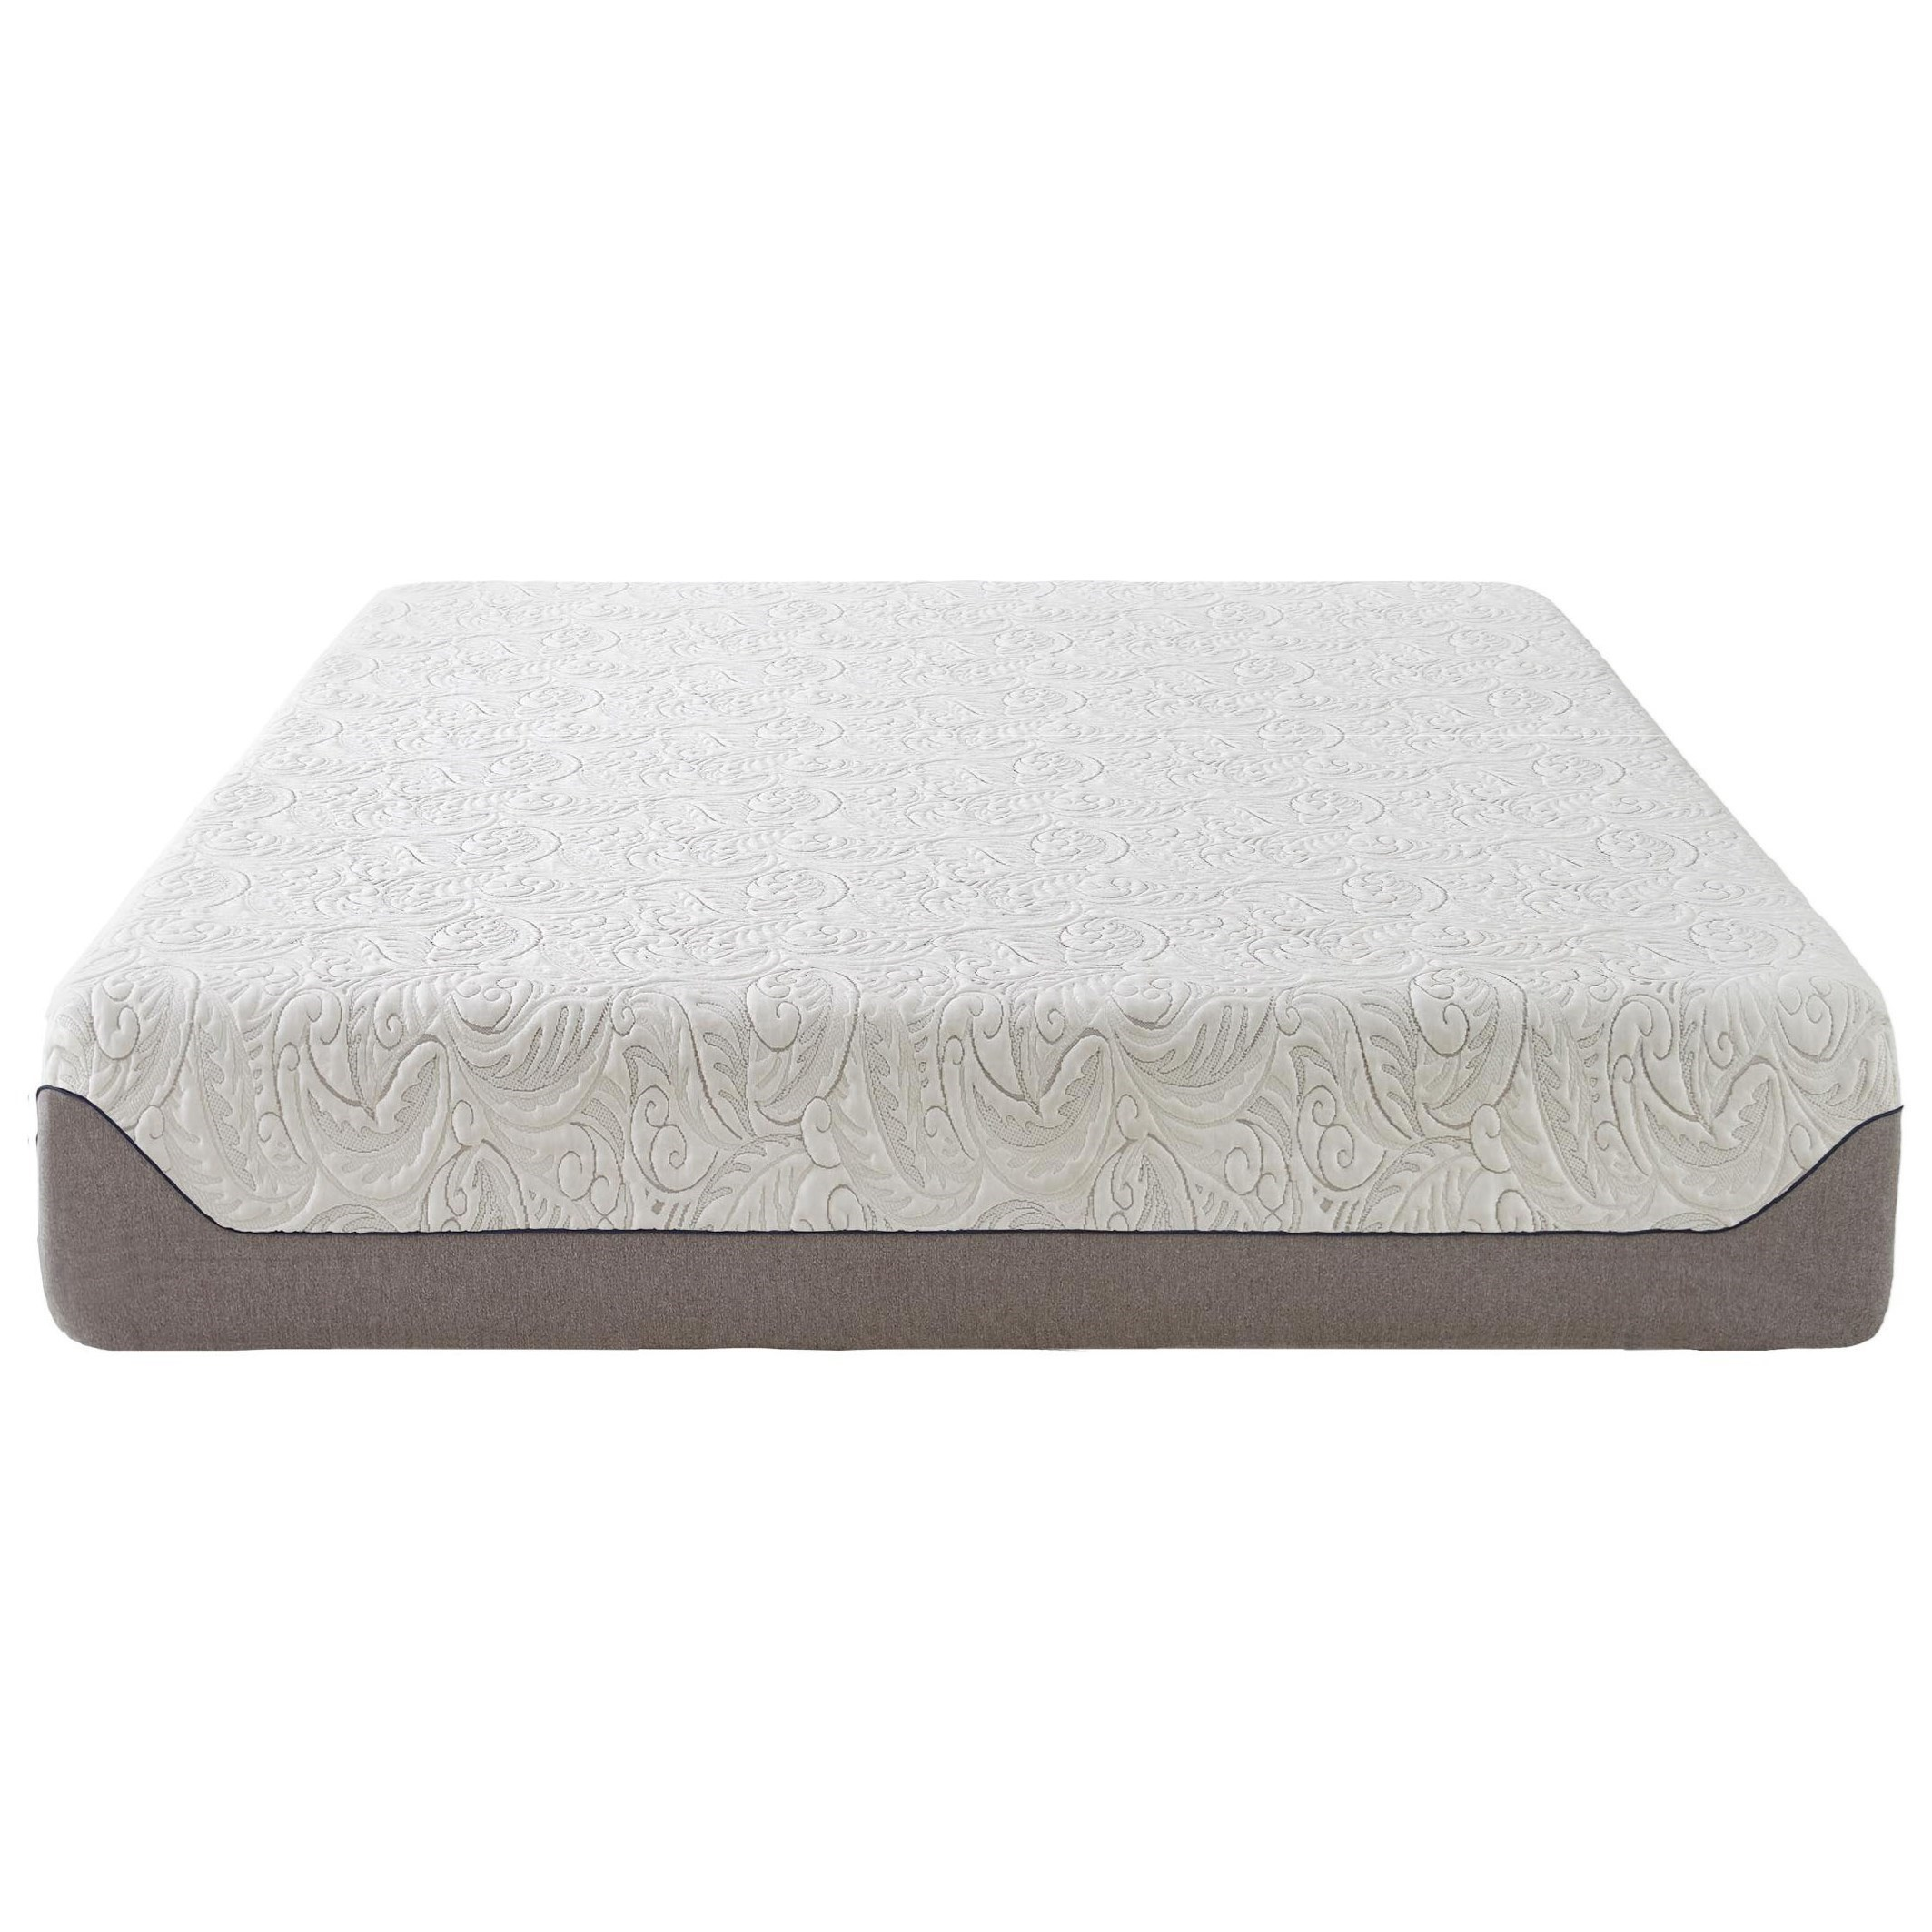 "5083 Ventura Grande Cal King 8"" Gel Memory Foam Mattress by Boyd Specialty Sleep at SlumberWorld"